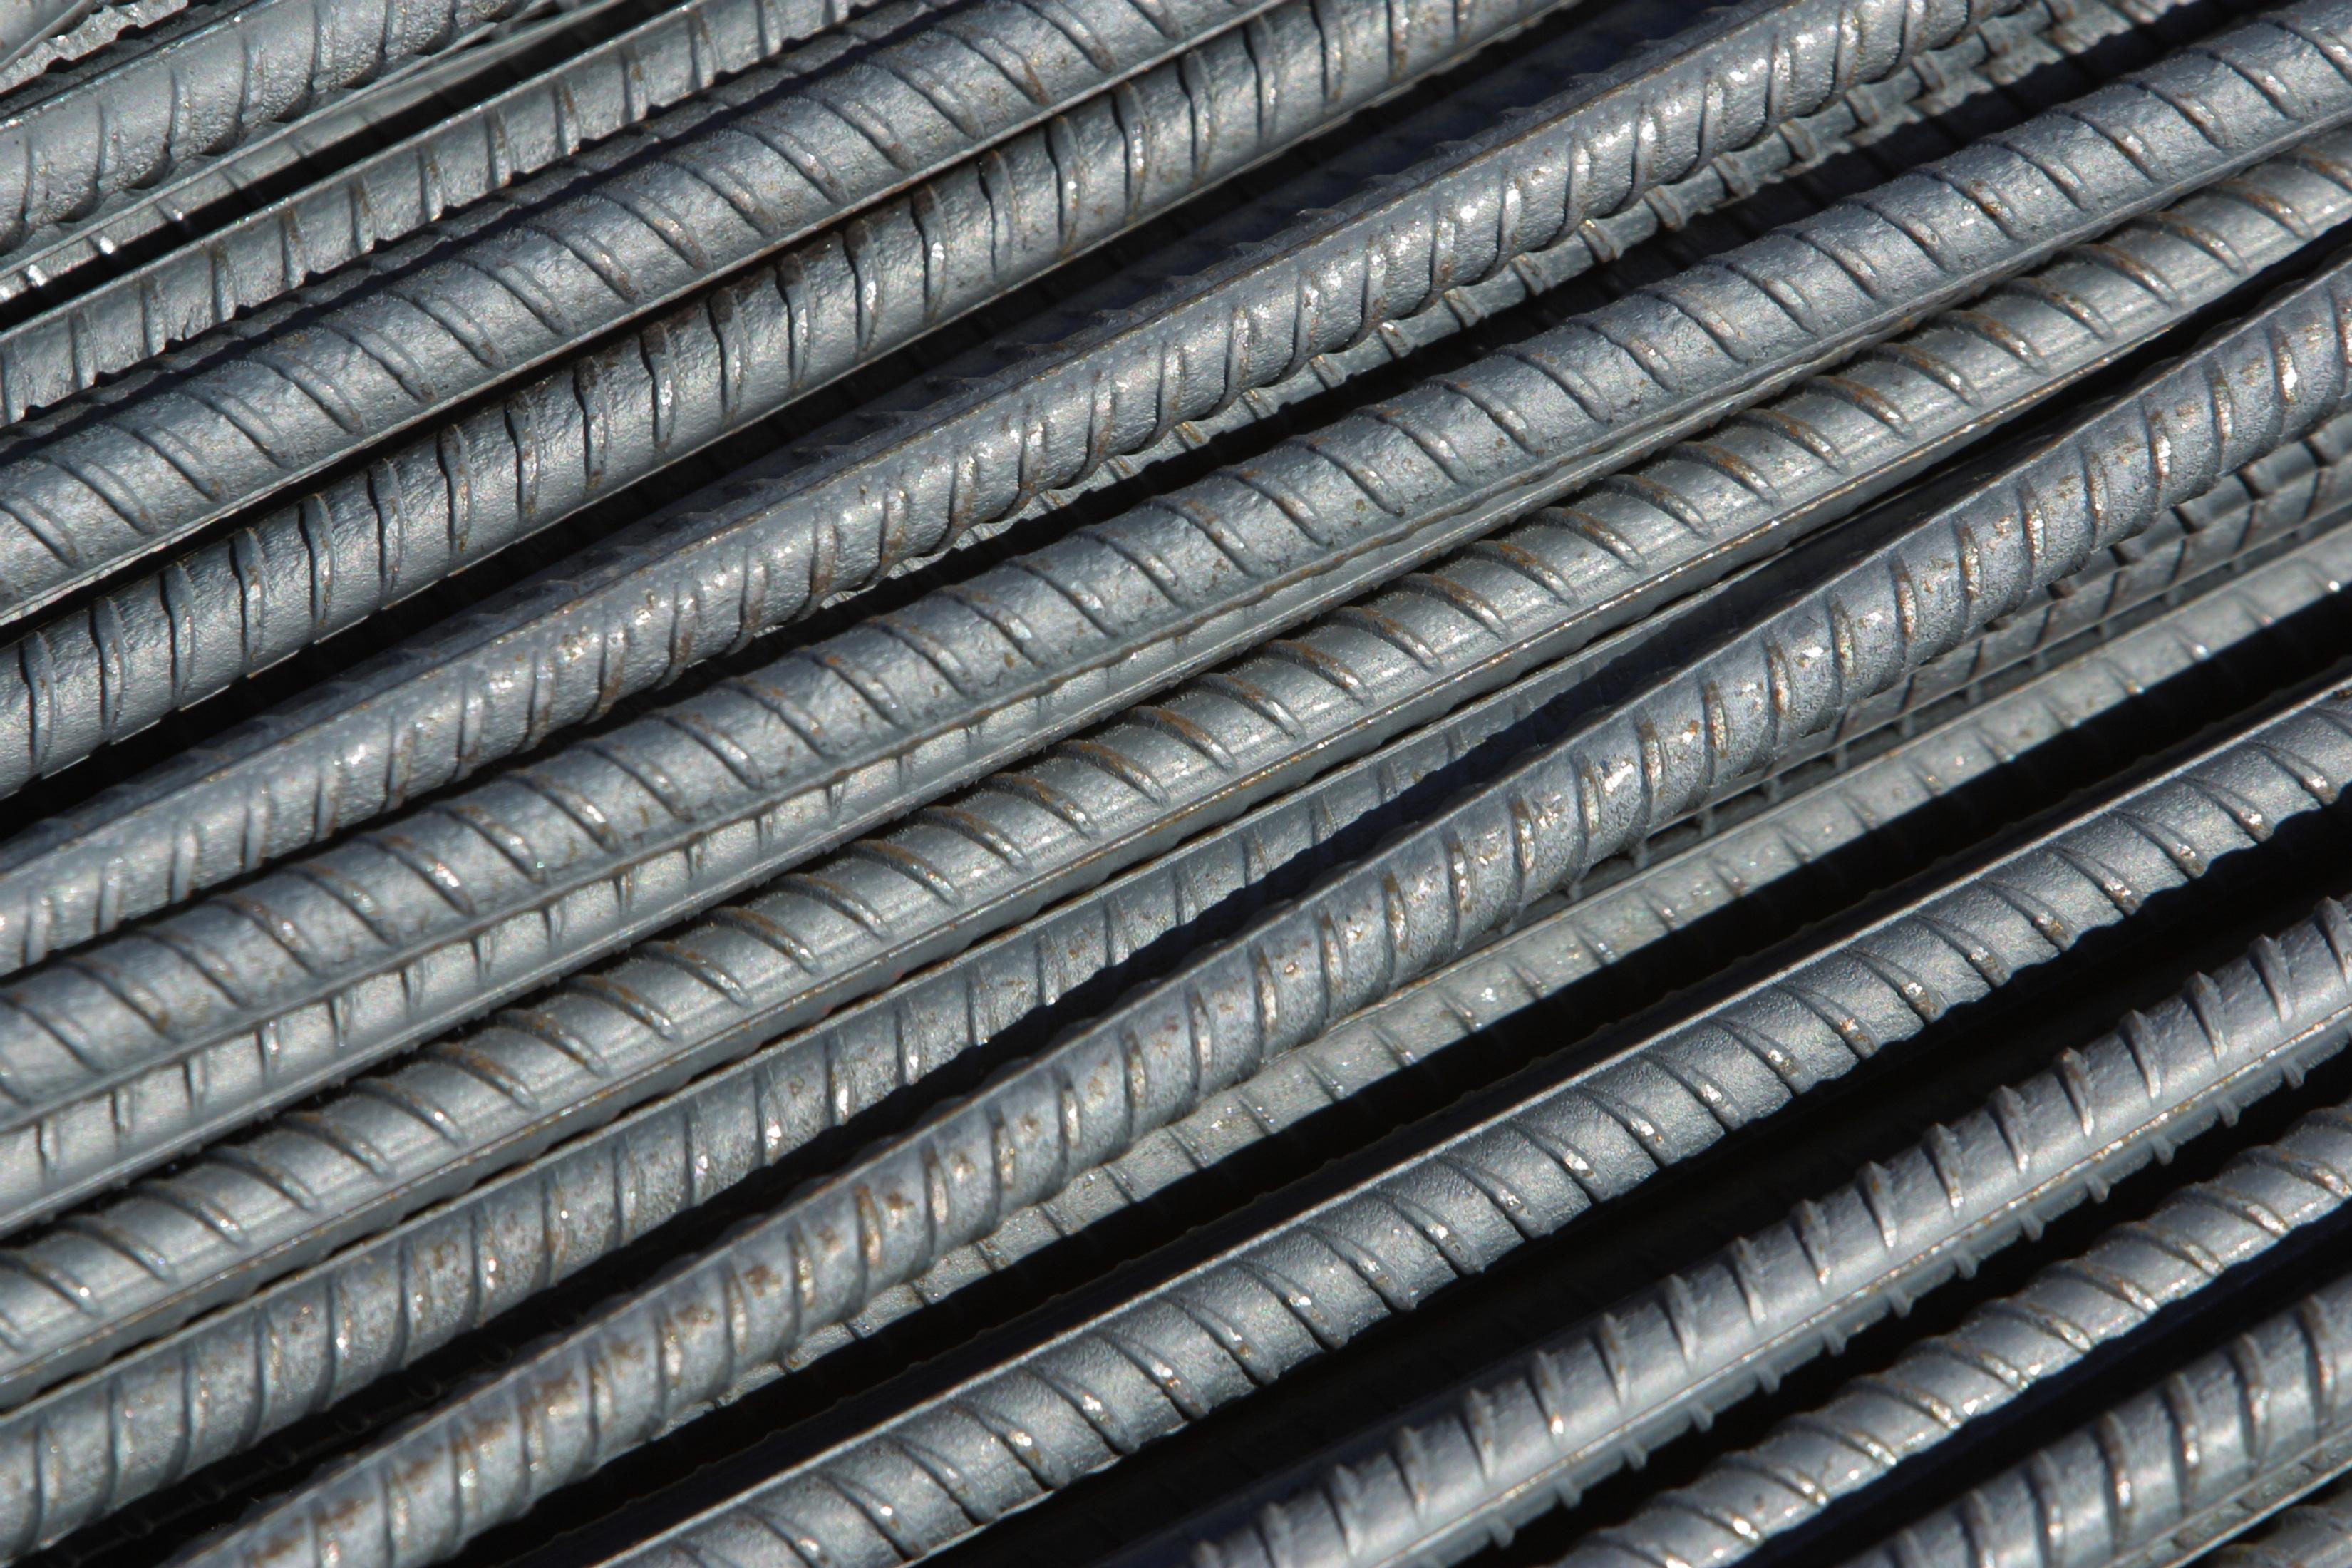 Steel Reinforcement Bars : Reinforcing bars re steel supply company inc